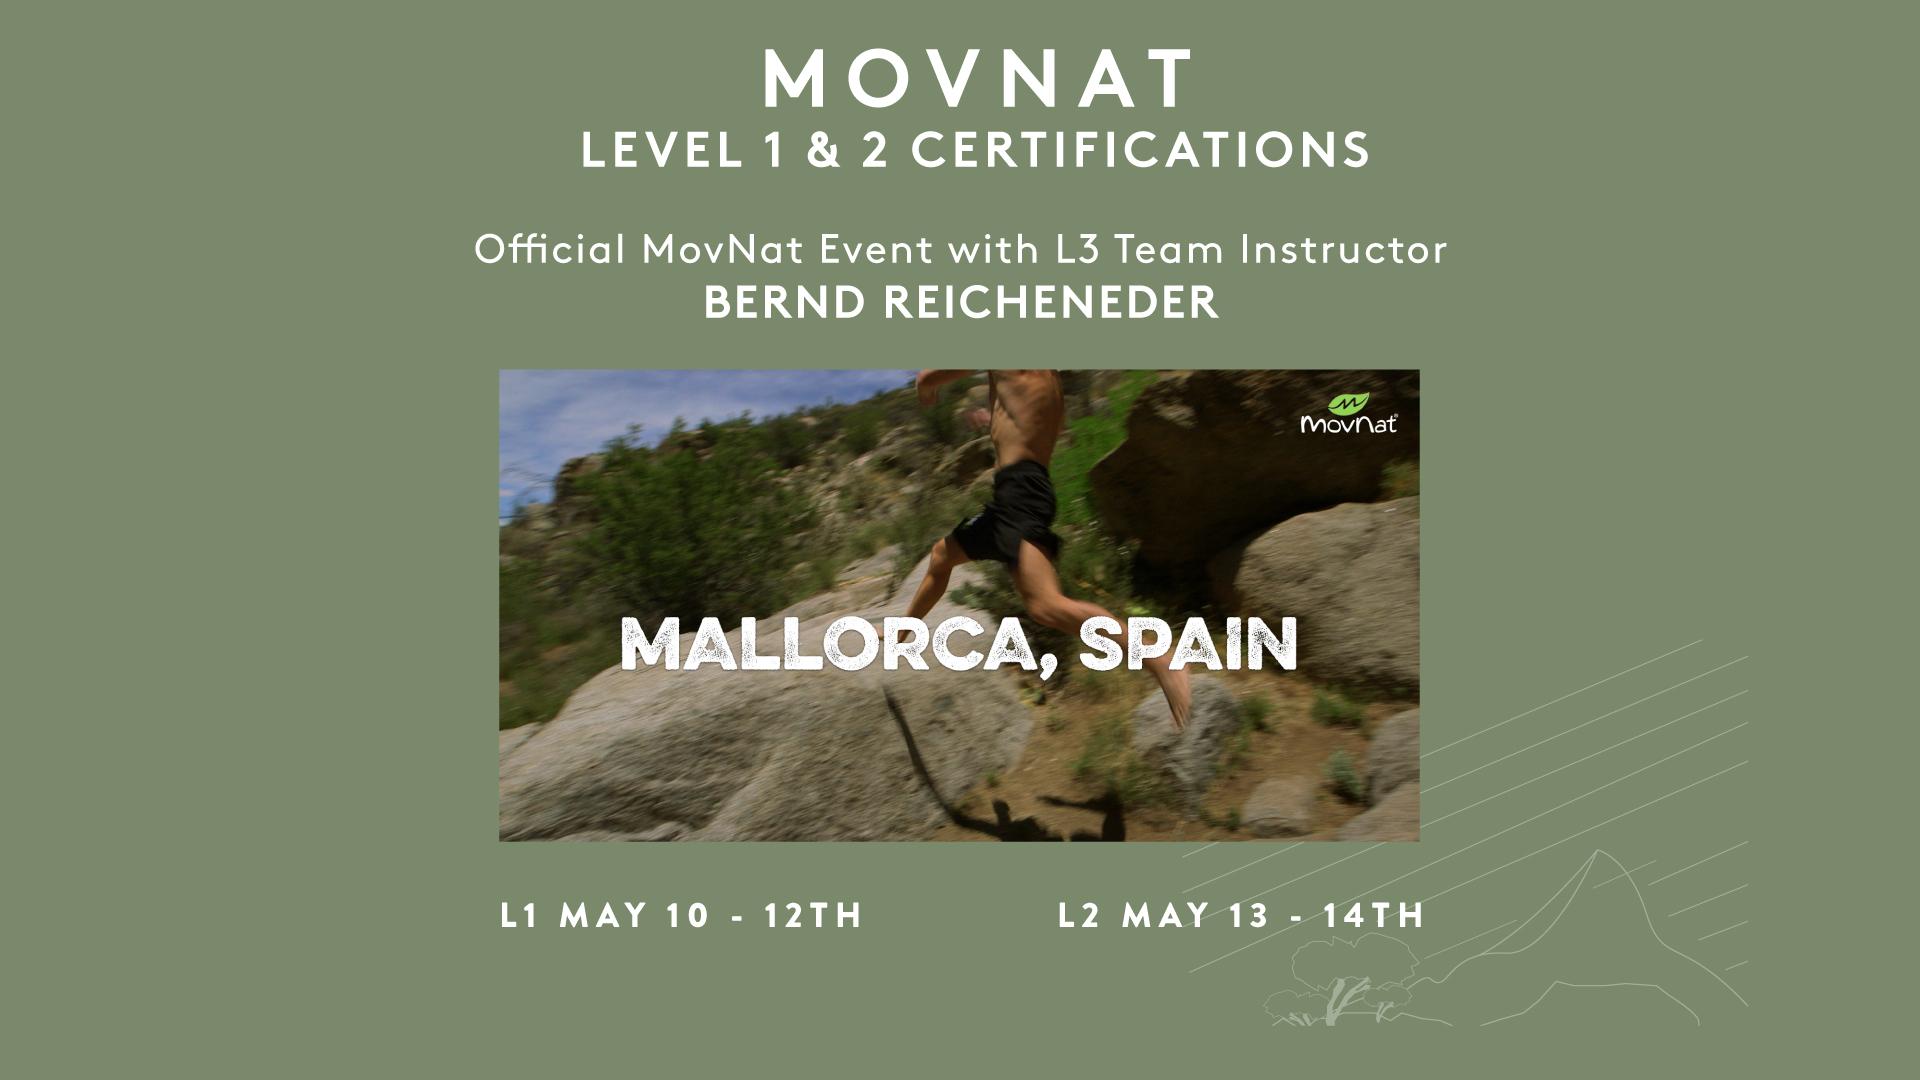 MovNat-Certifications-web-1920x1080px.jpg